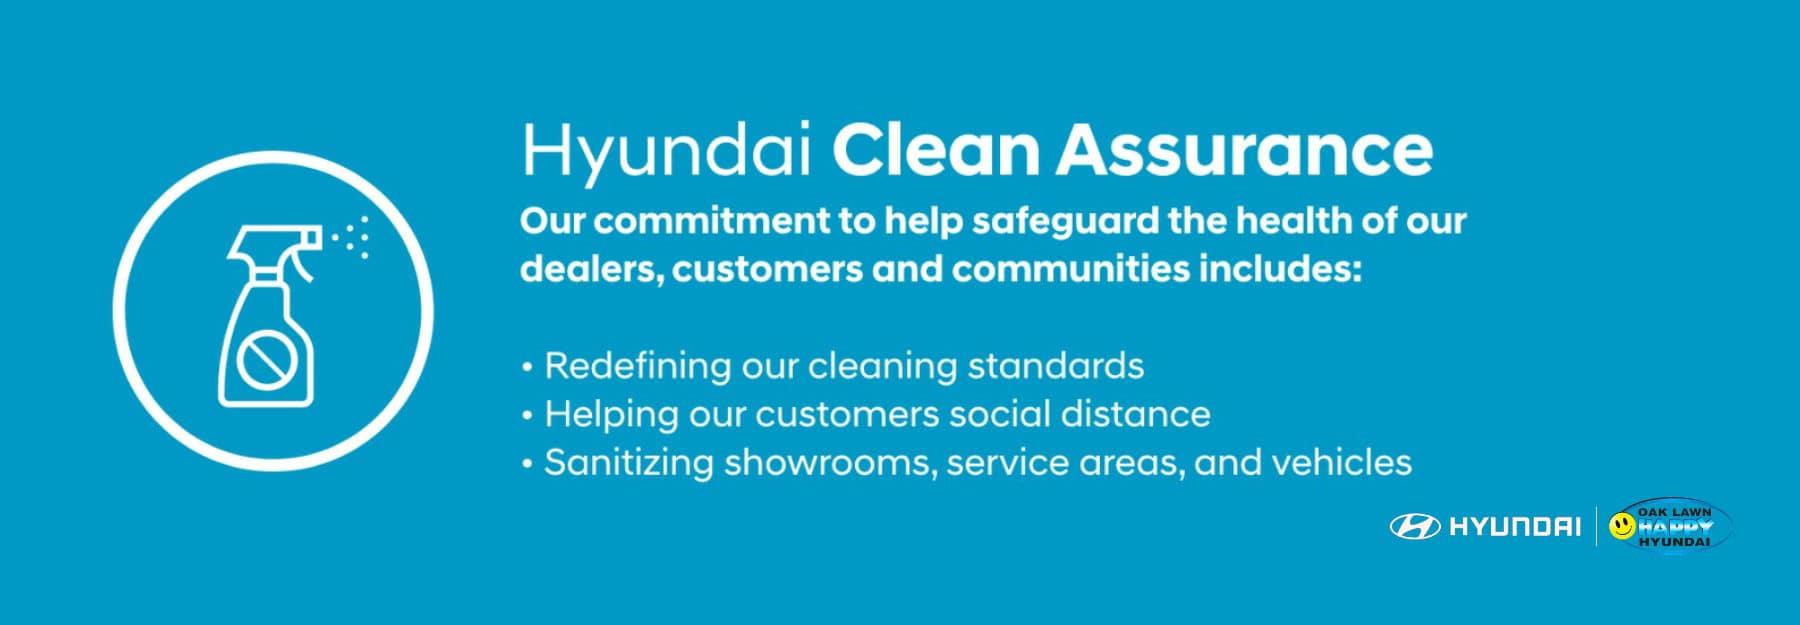 September-2020 Clean Assurance_Happy_Hyundai_1400x514